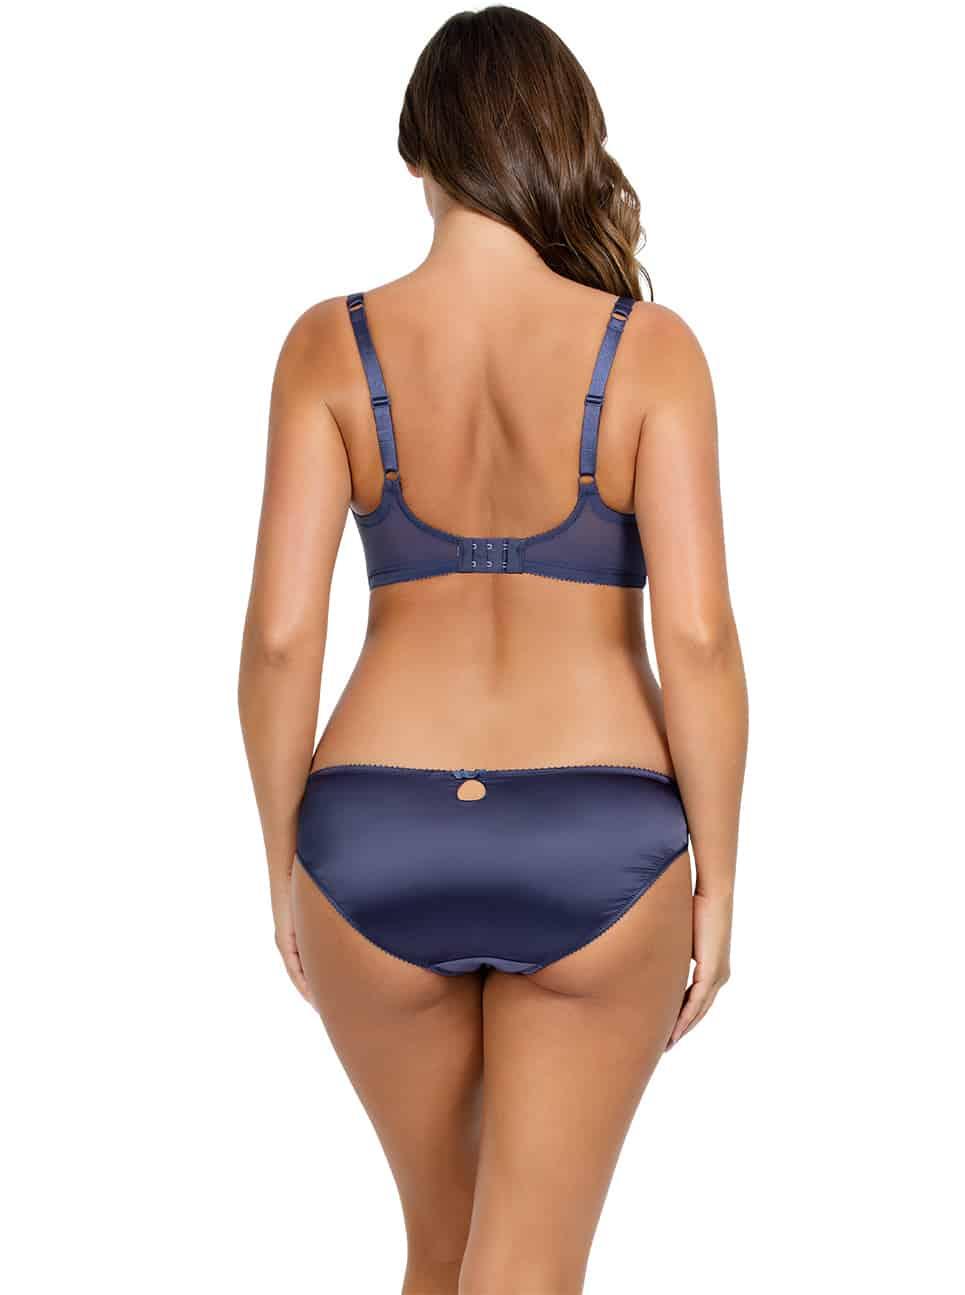 PARFAIT Mariela ContourPaddedBraP5581 BikiniP5583 Nightshadow Back copy 2 - Mariela Bikini - Nightshadow - P5583